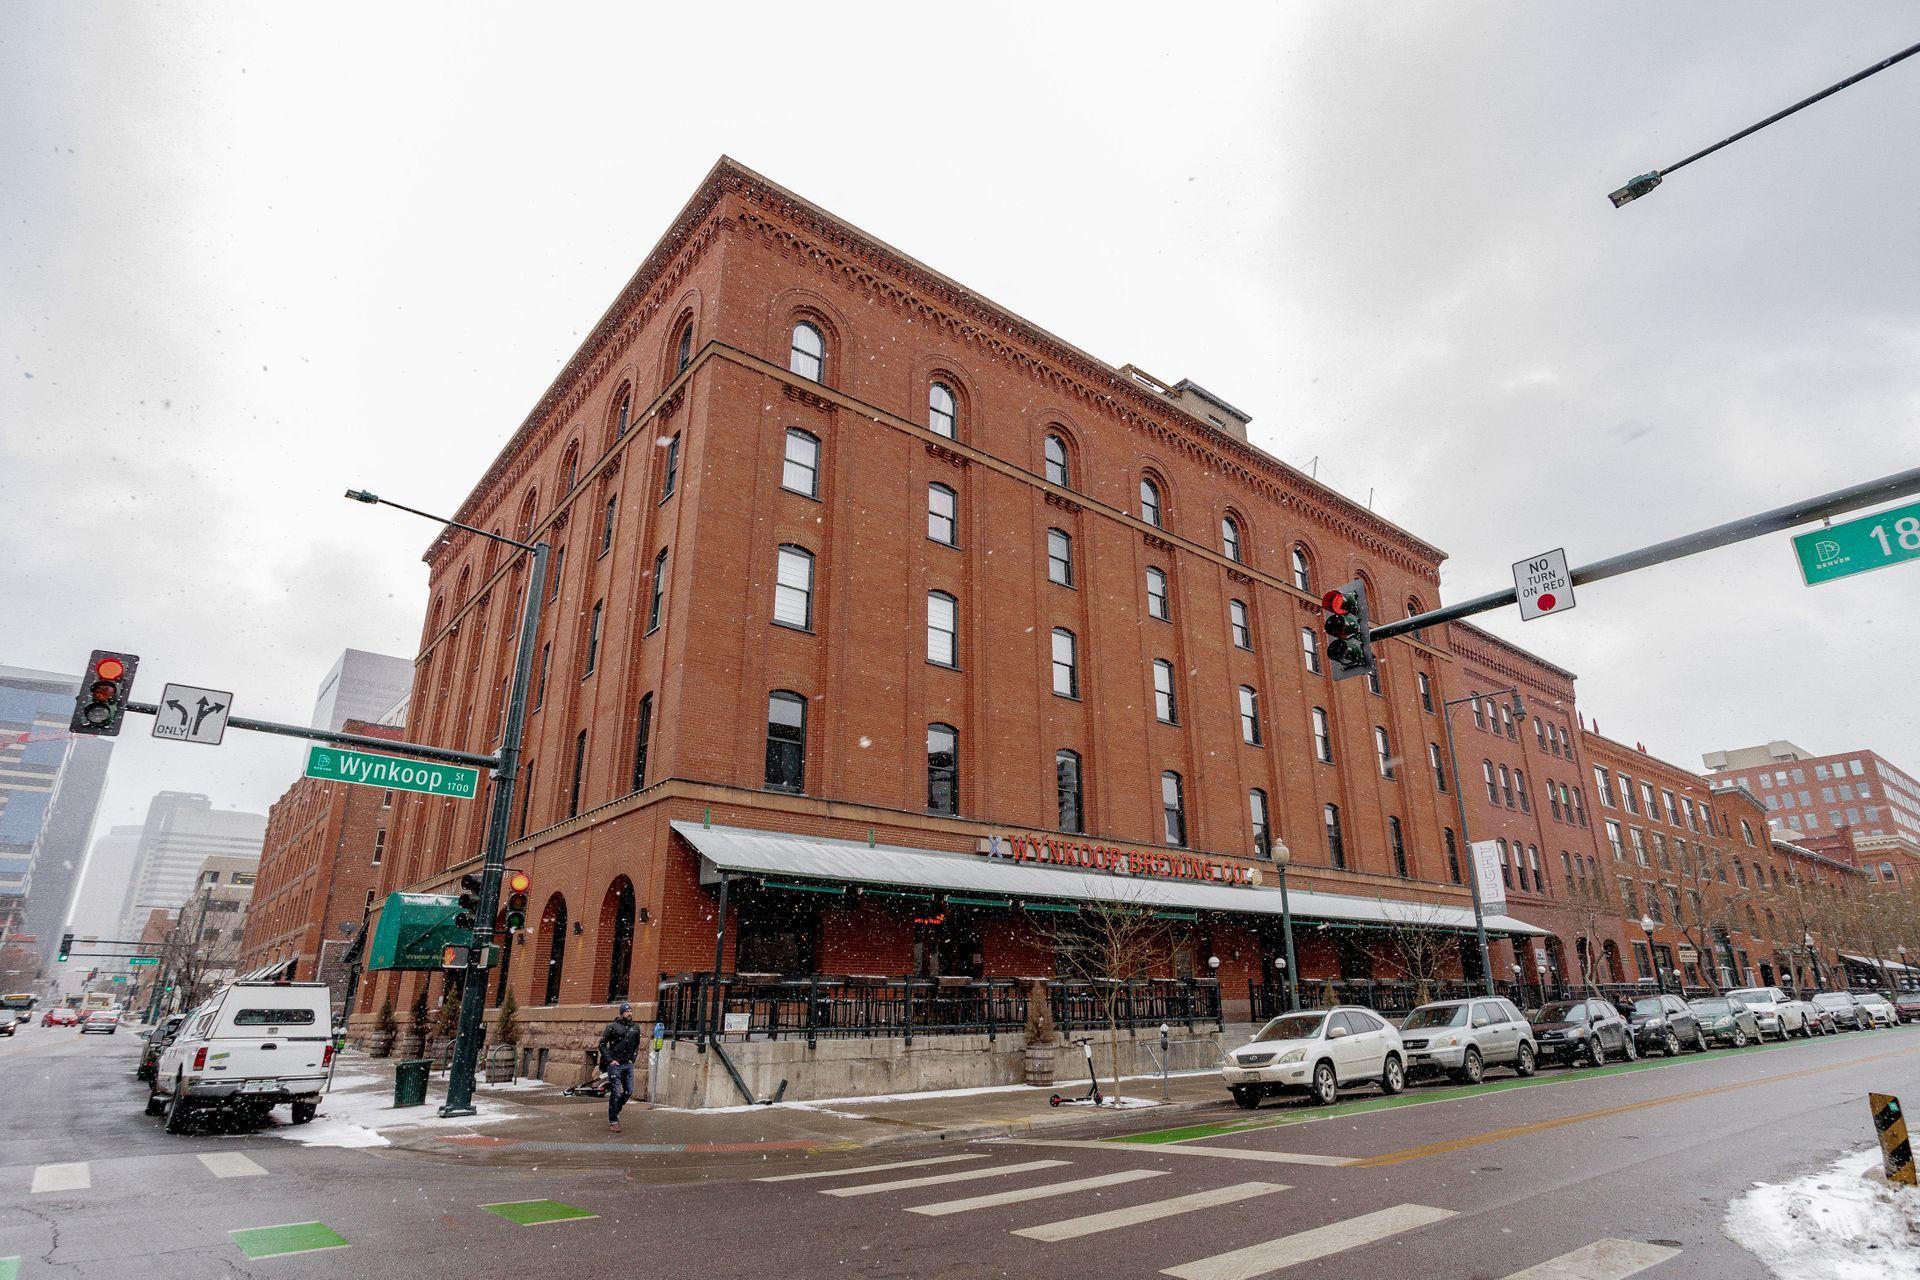 1792 Wynkoop Street, #502 exterior